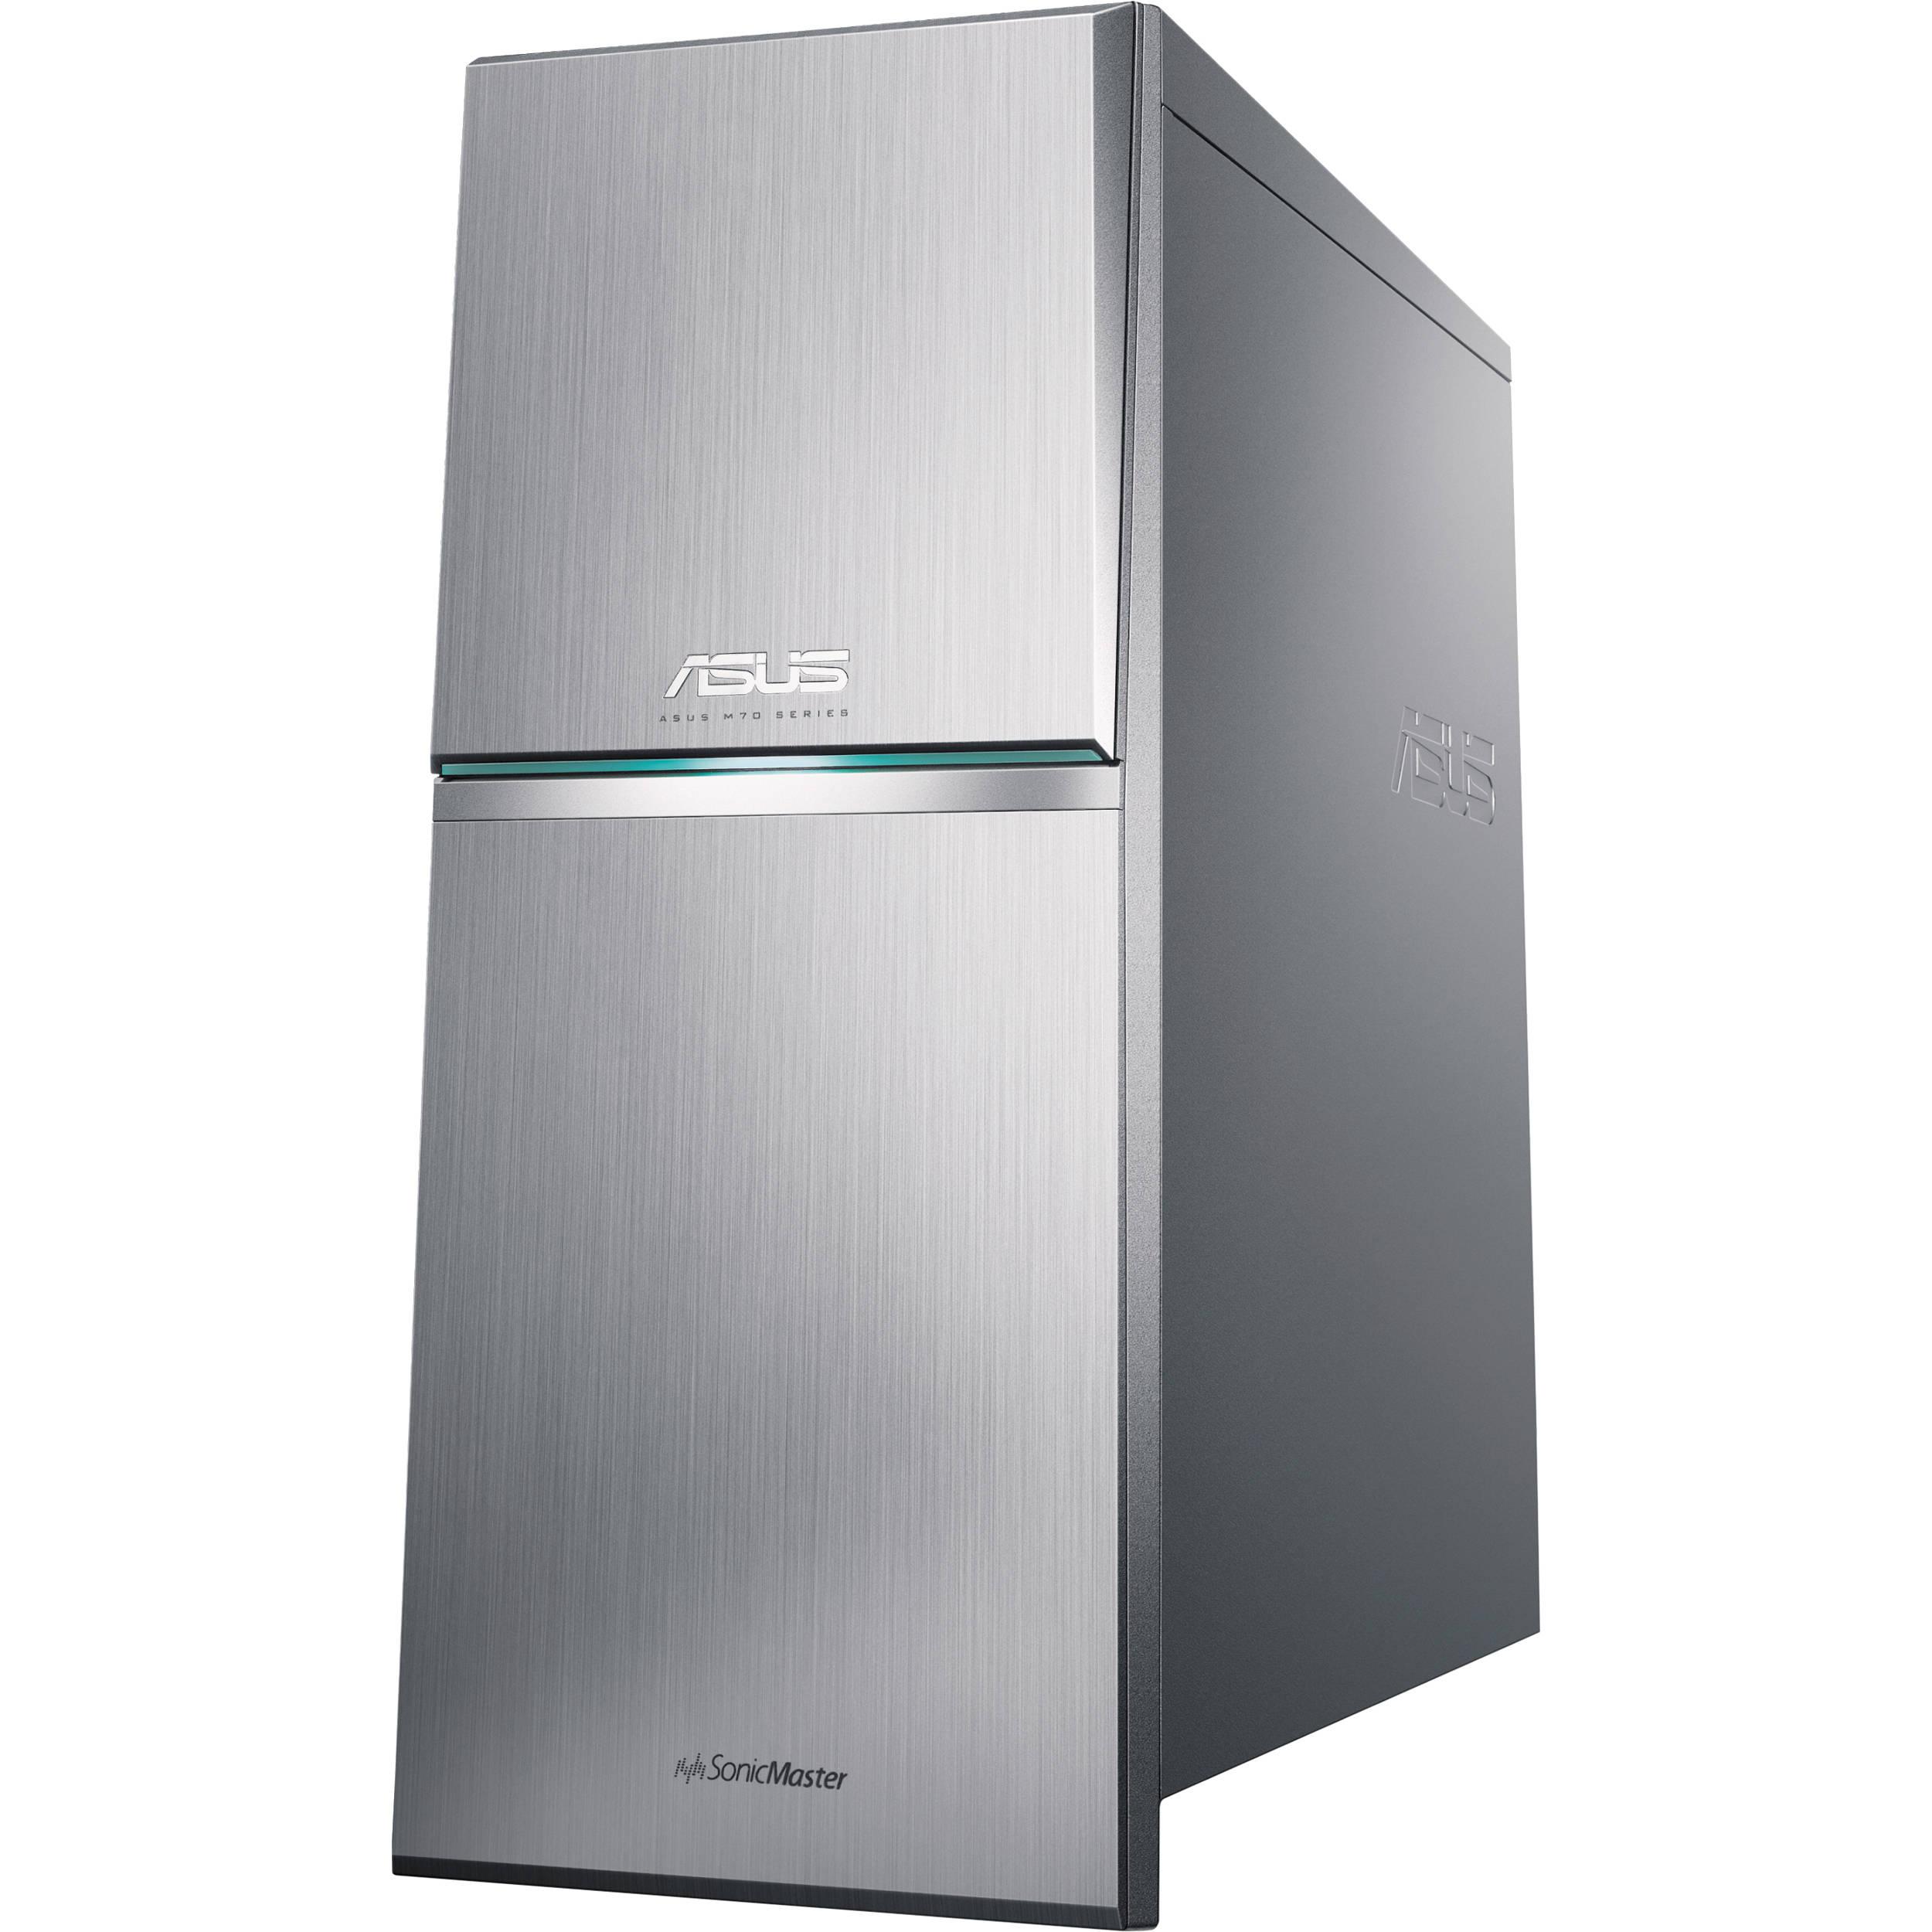 Asus m70ad us005s desktop computer